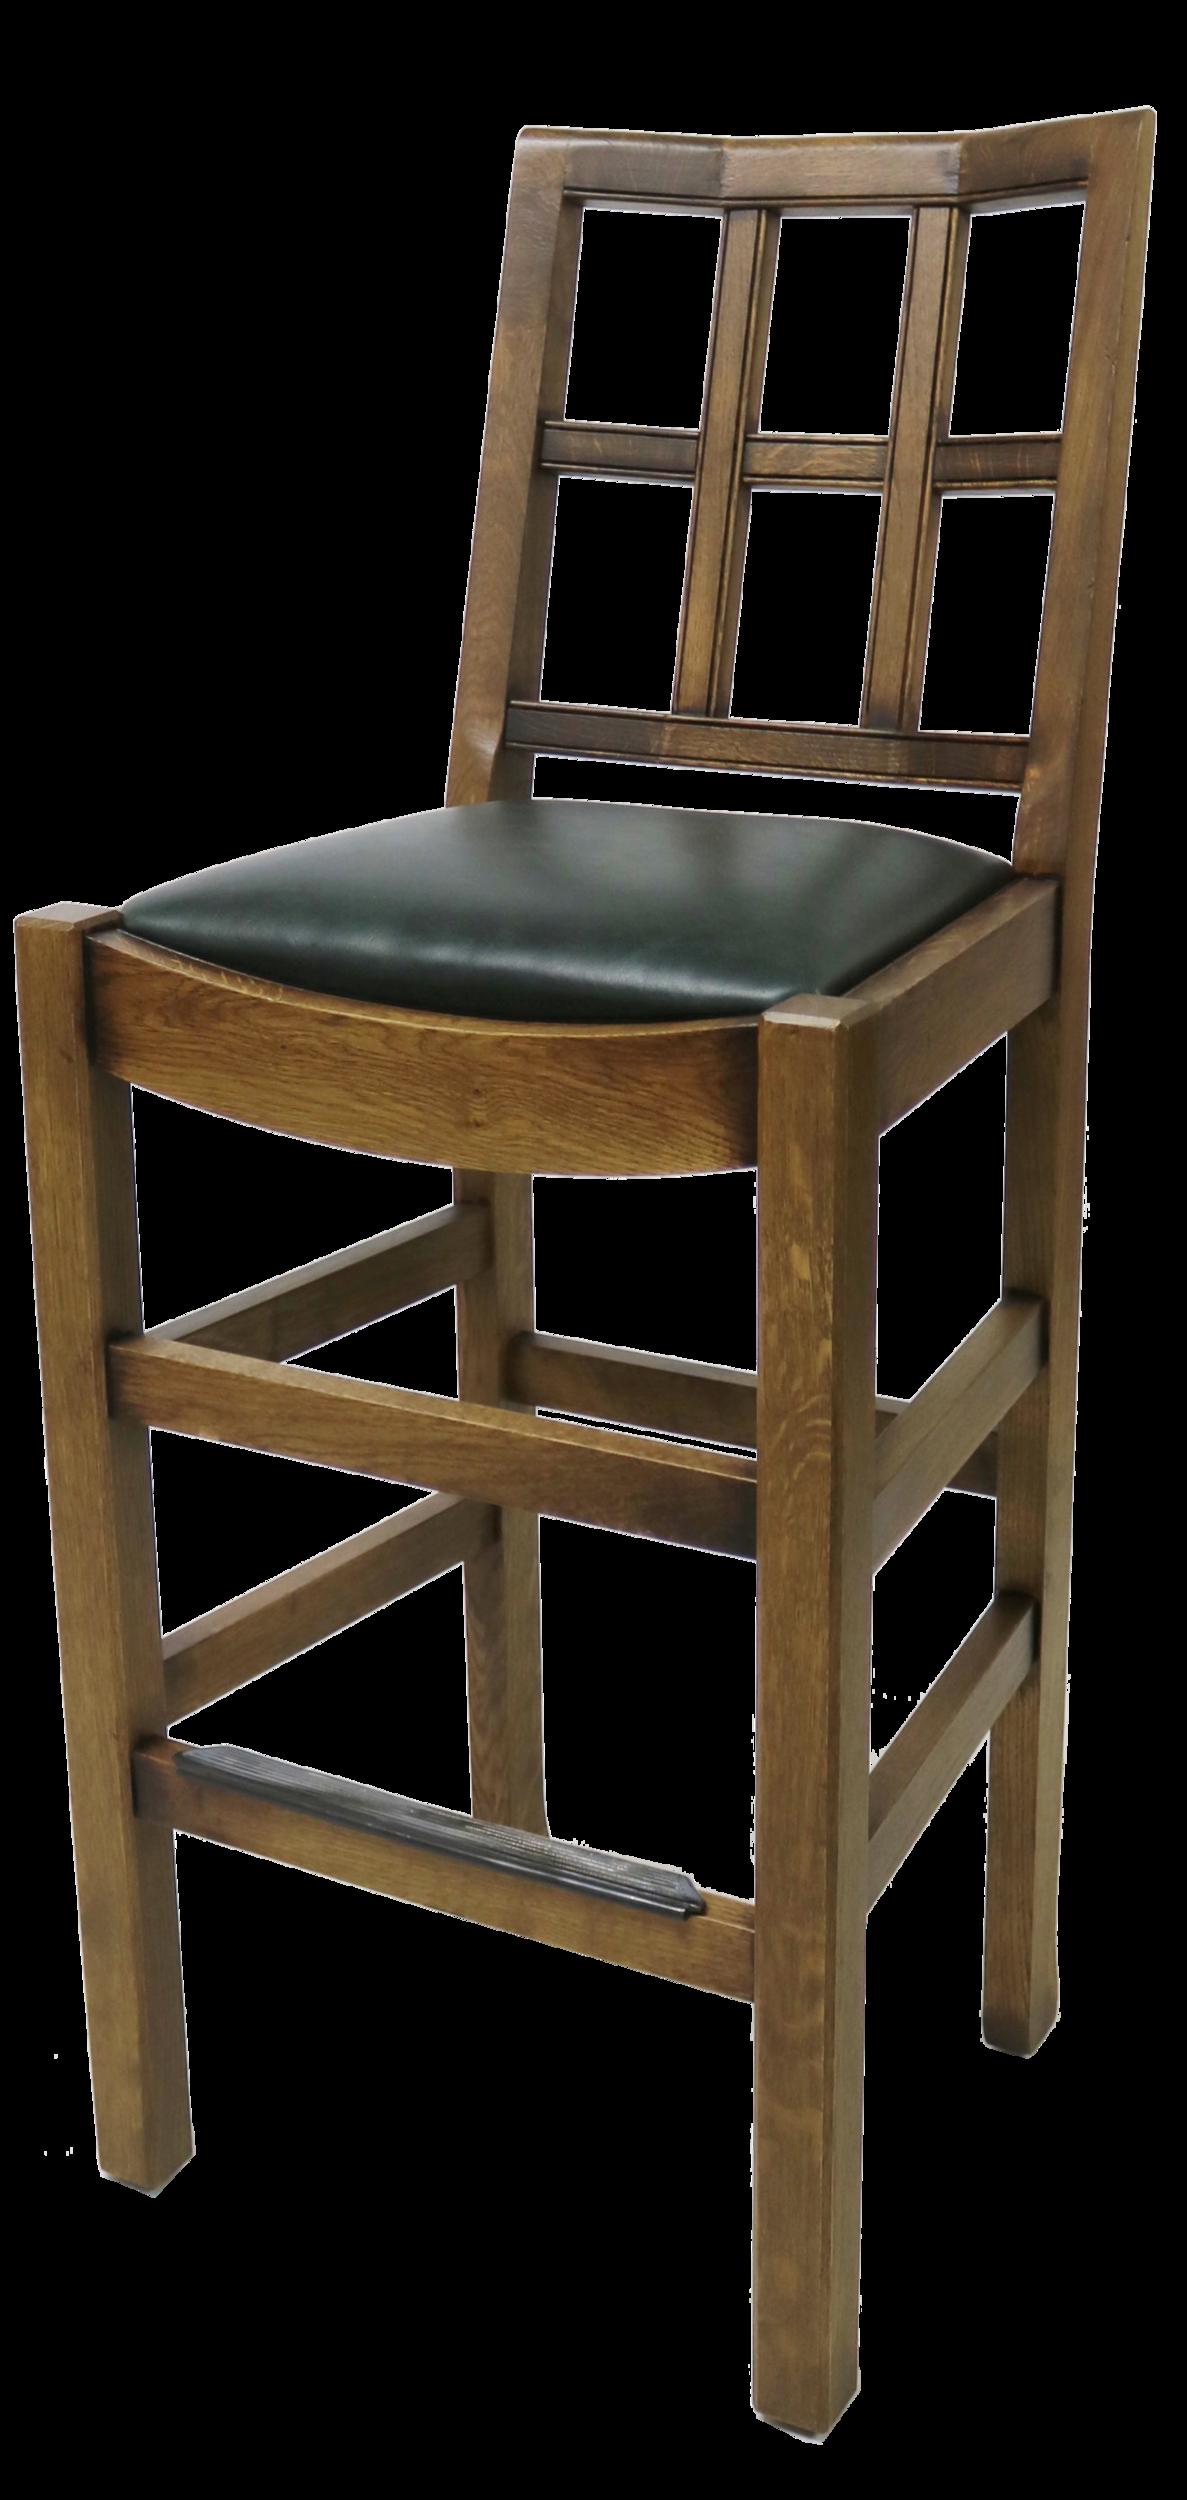 Heals Furniture - Tall/High Bar Stools